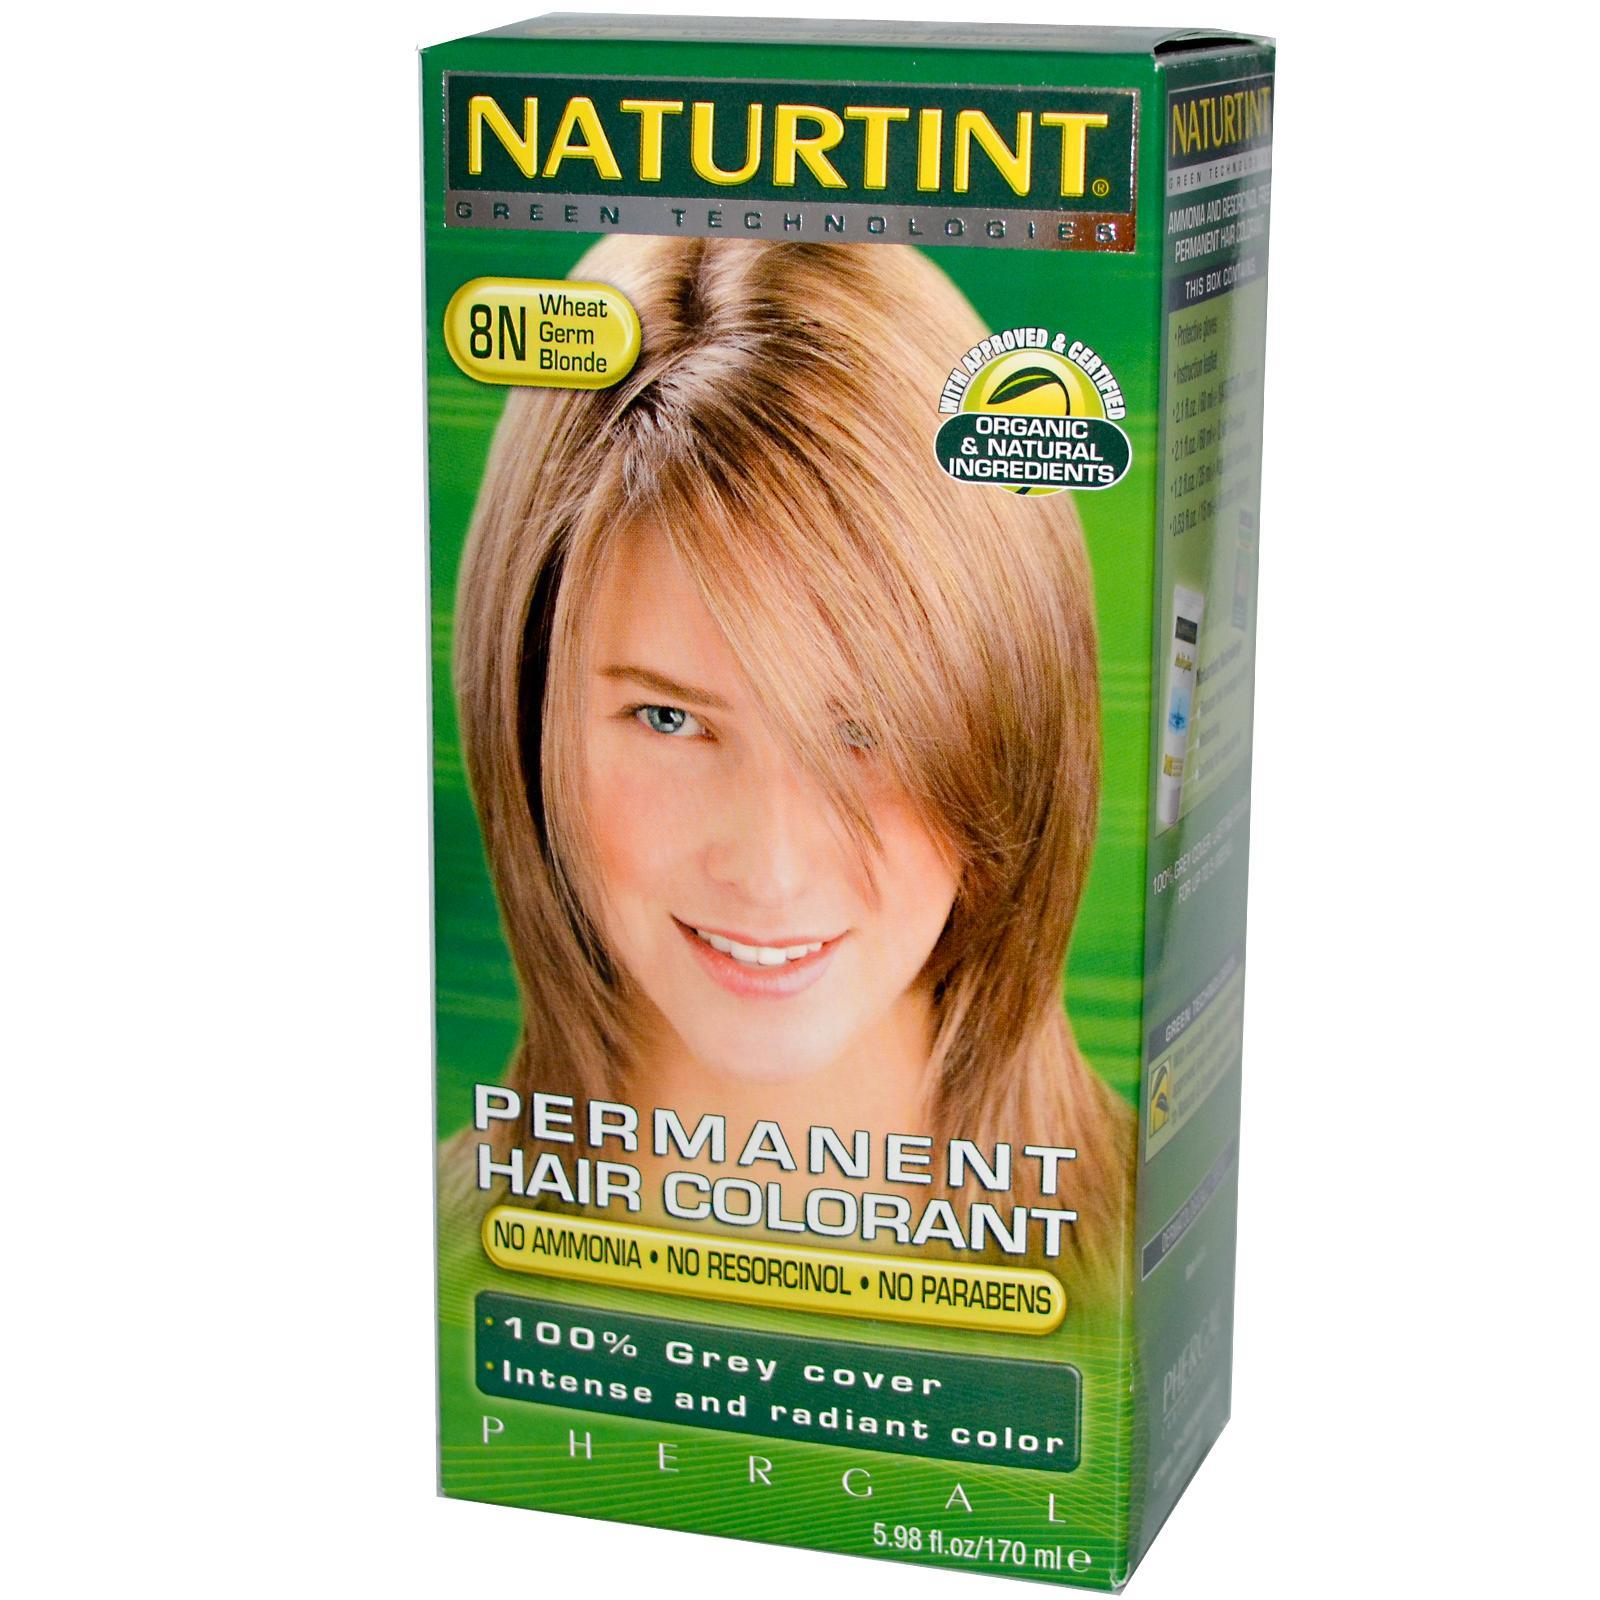 Naturtint 8n Wheat Germ Blonde Hair Color (1xKit)